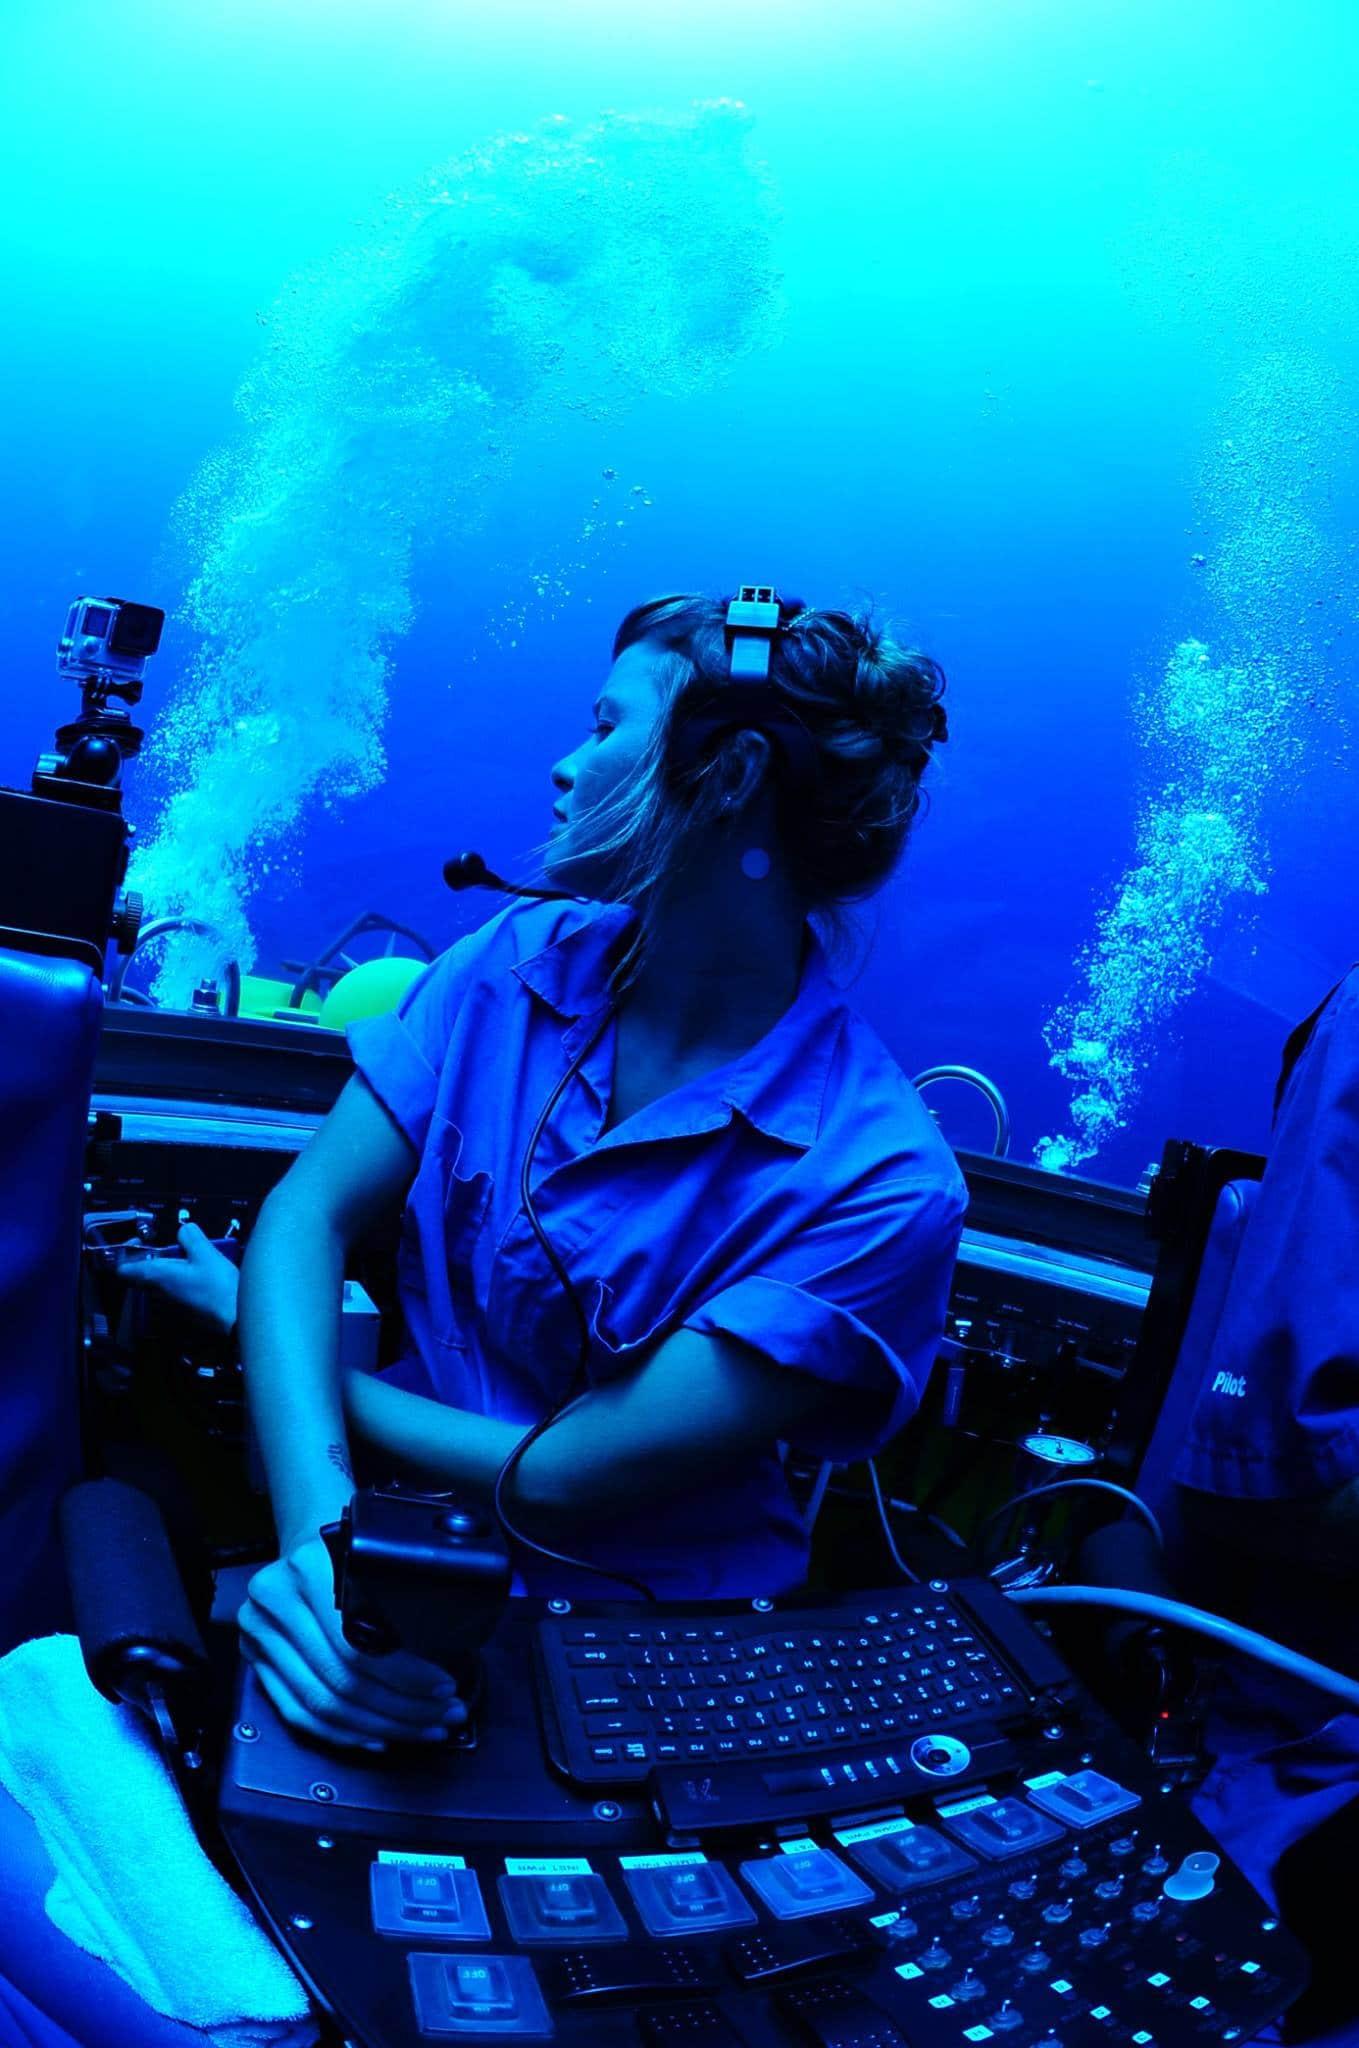 Diana Garcia Benito inside a submarine pilotting it underwater